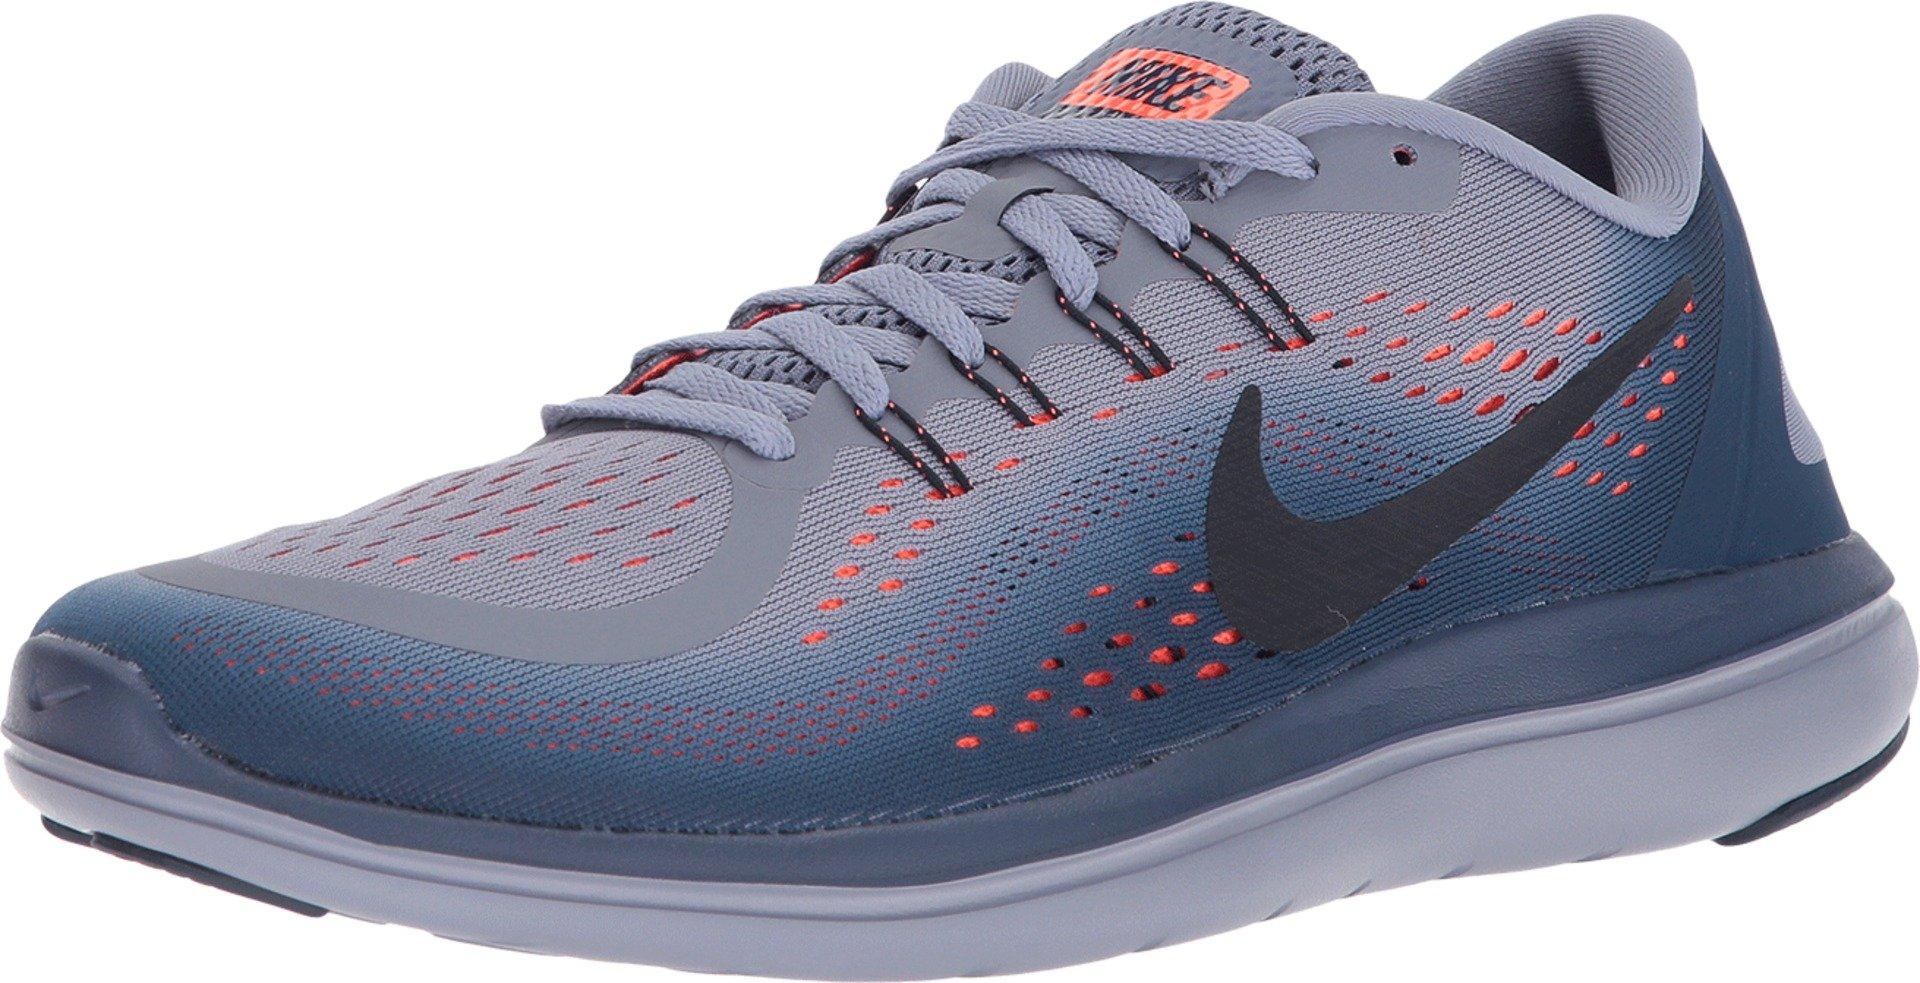 1e3541f341e14 Nike Men's Flex RN 2017 Running Shoe Dark Sky Blue/Dark Obsidian/Navy Size  14 M US